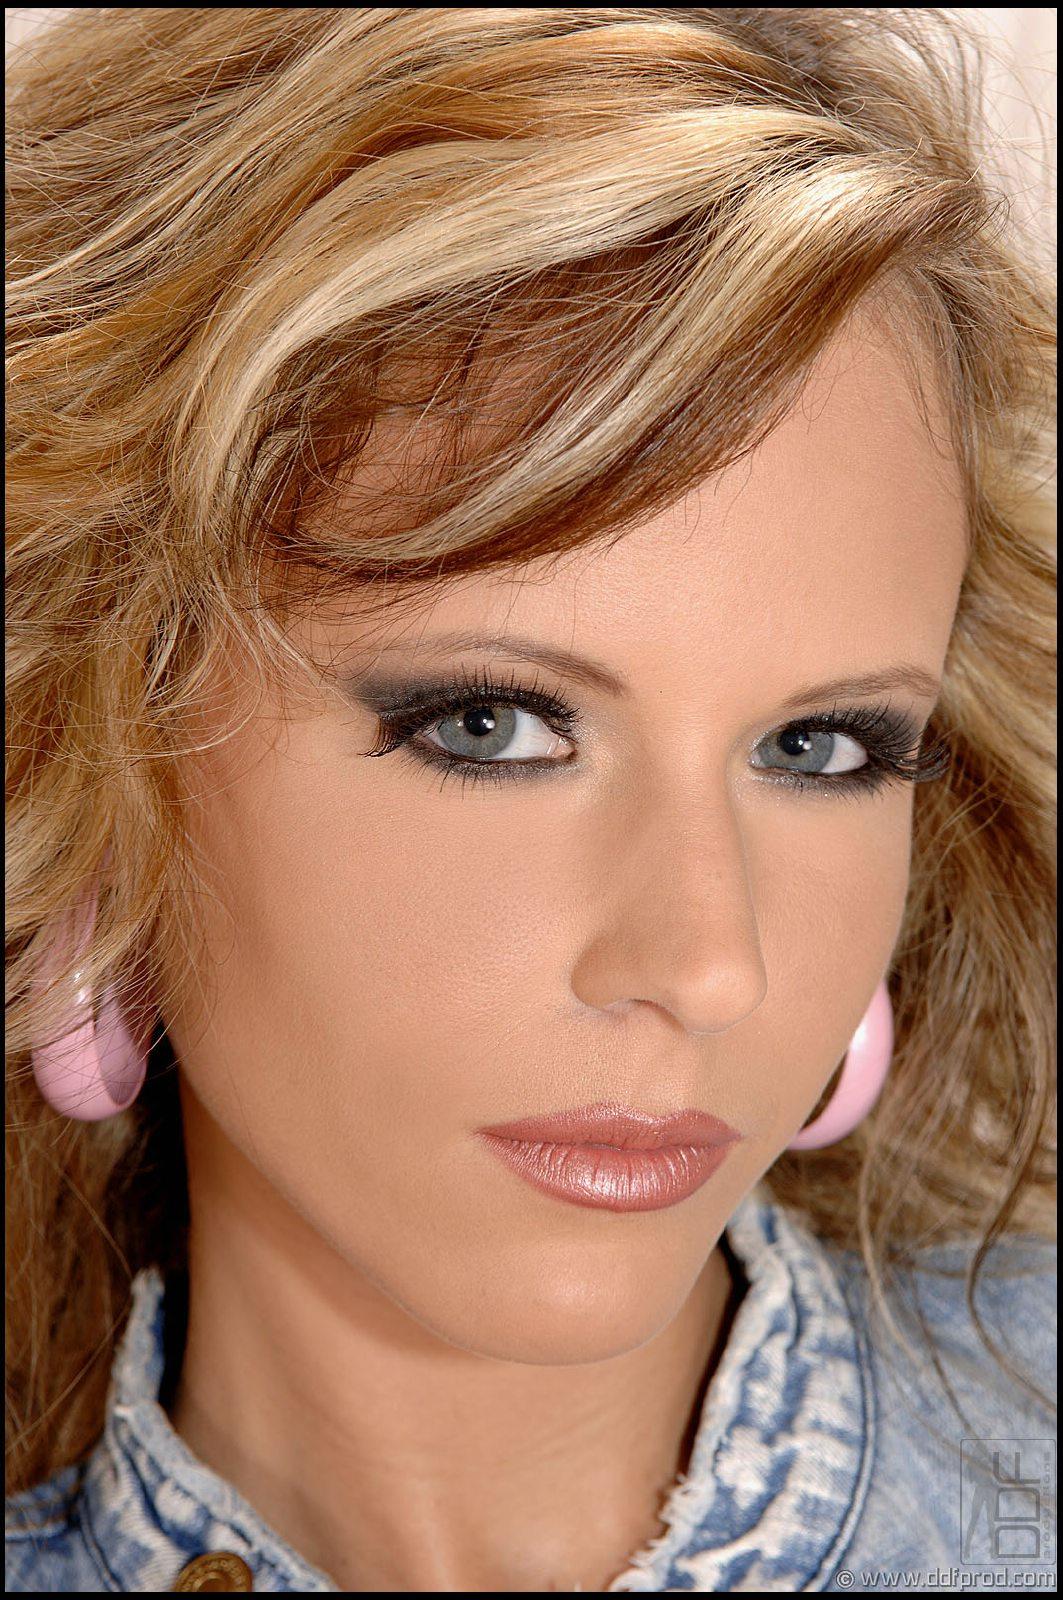 Raylene Richards